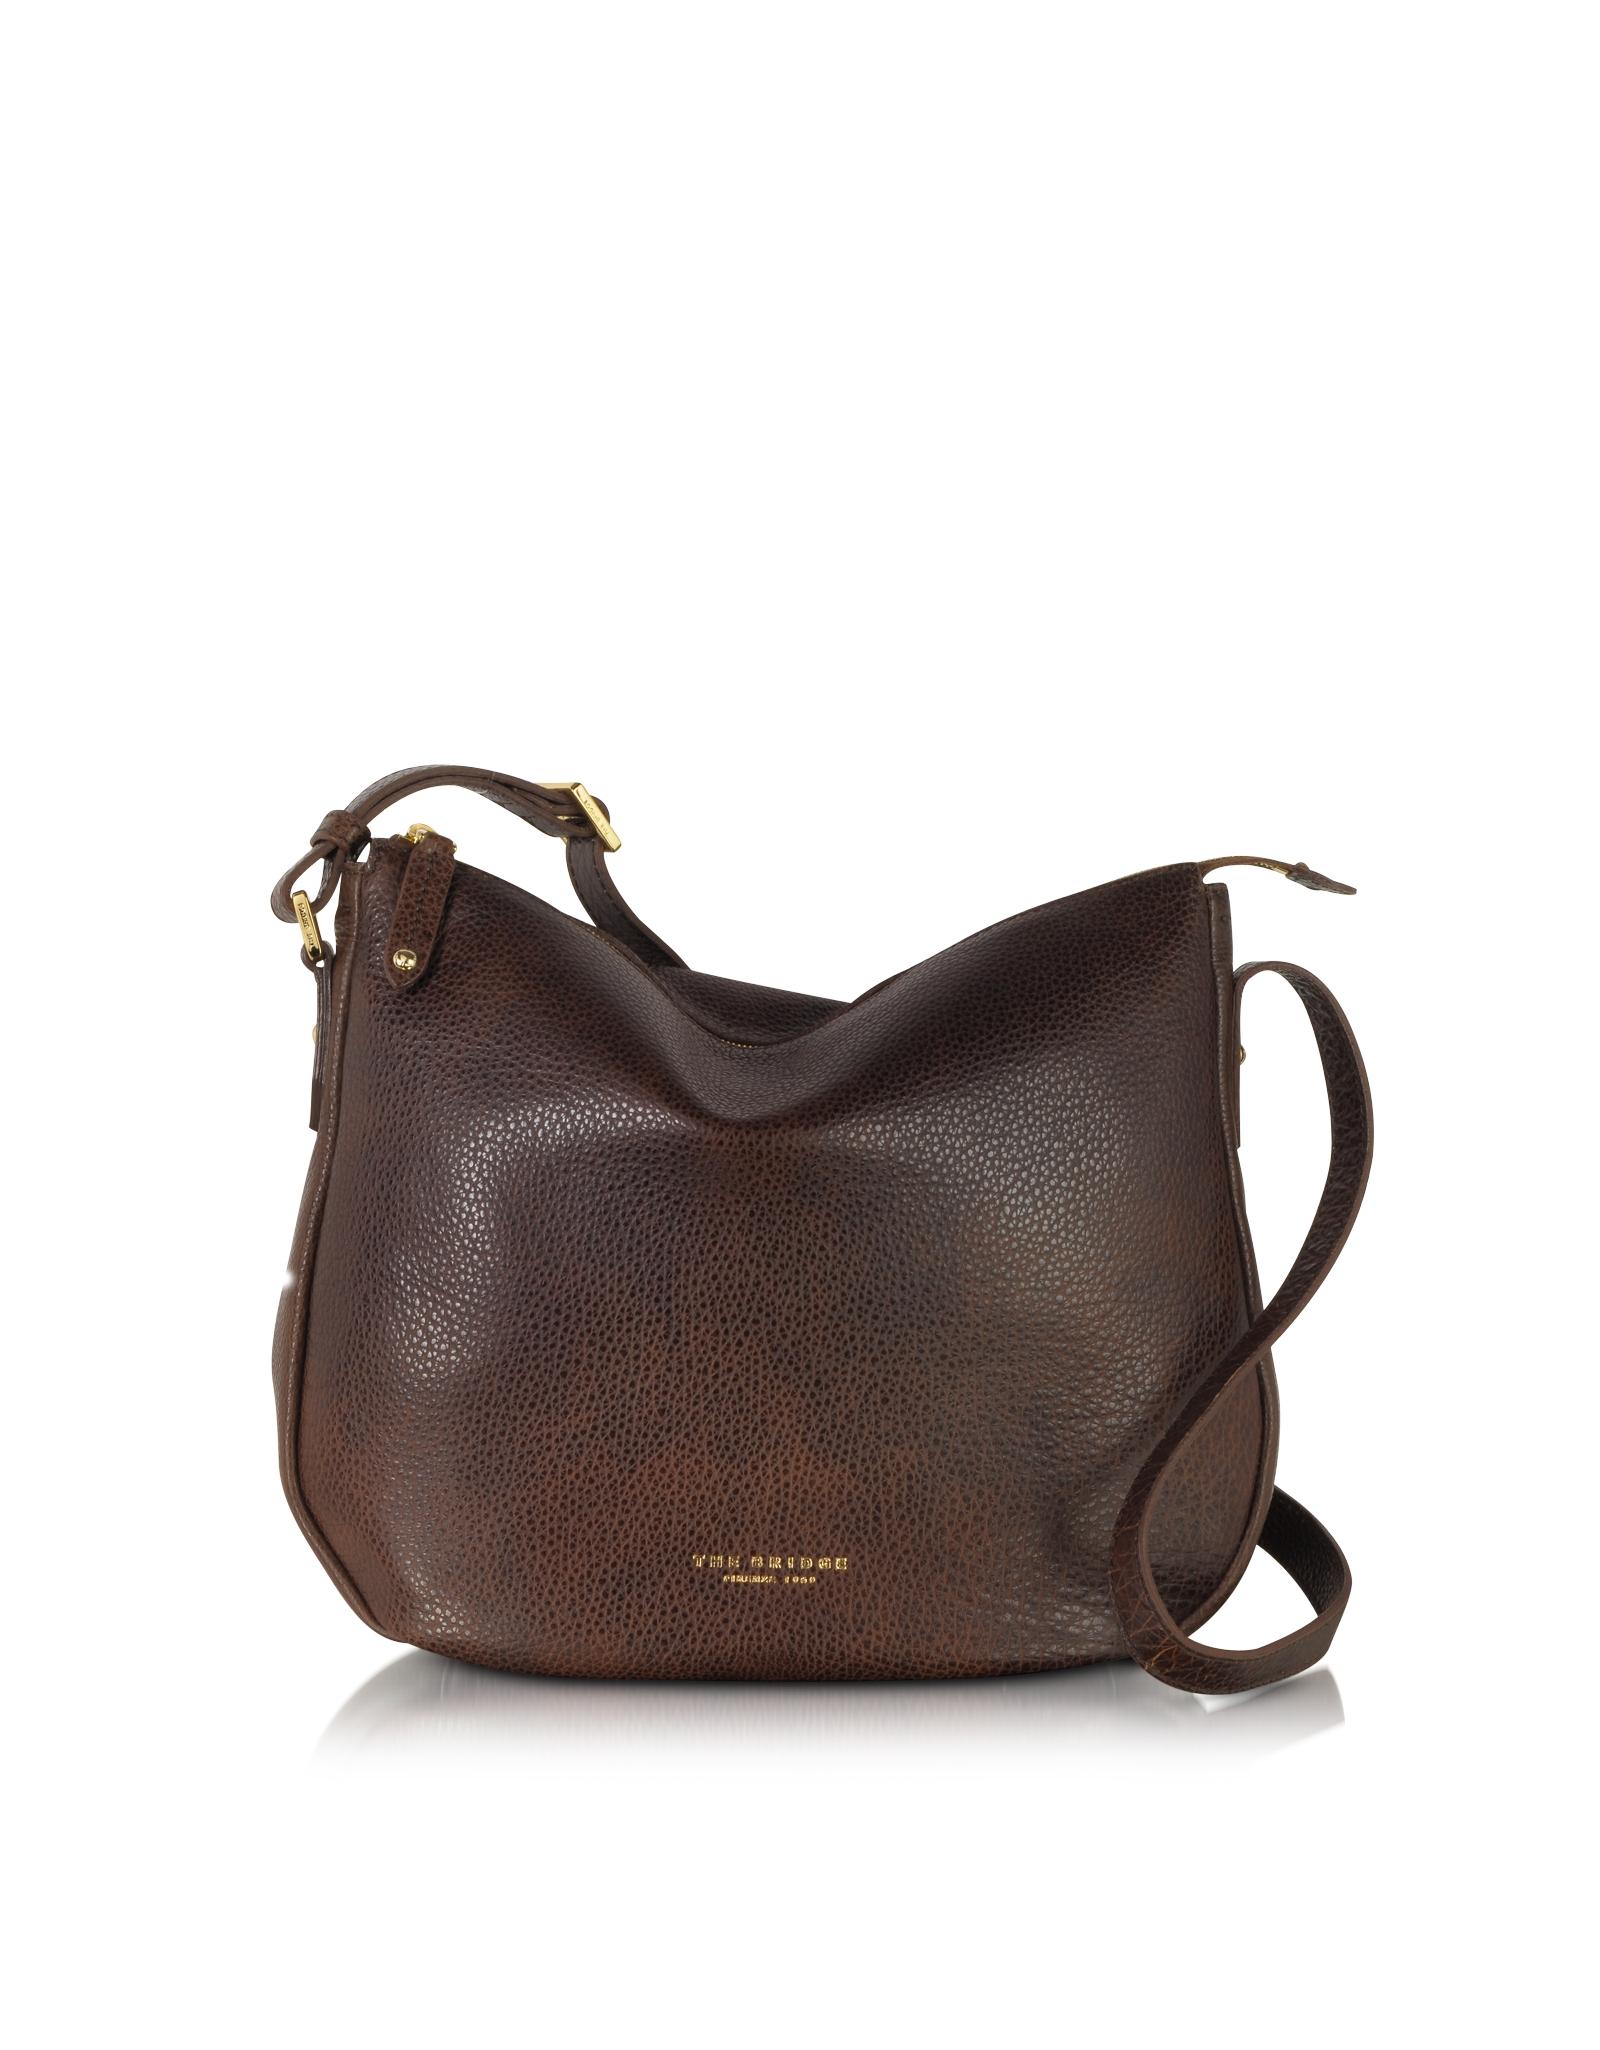 Lyst The Bridge Sfoderata Soft Dark Brown Leather Shoulder Bag In 4d53856f1d22a